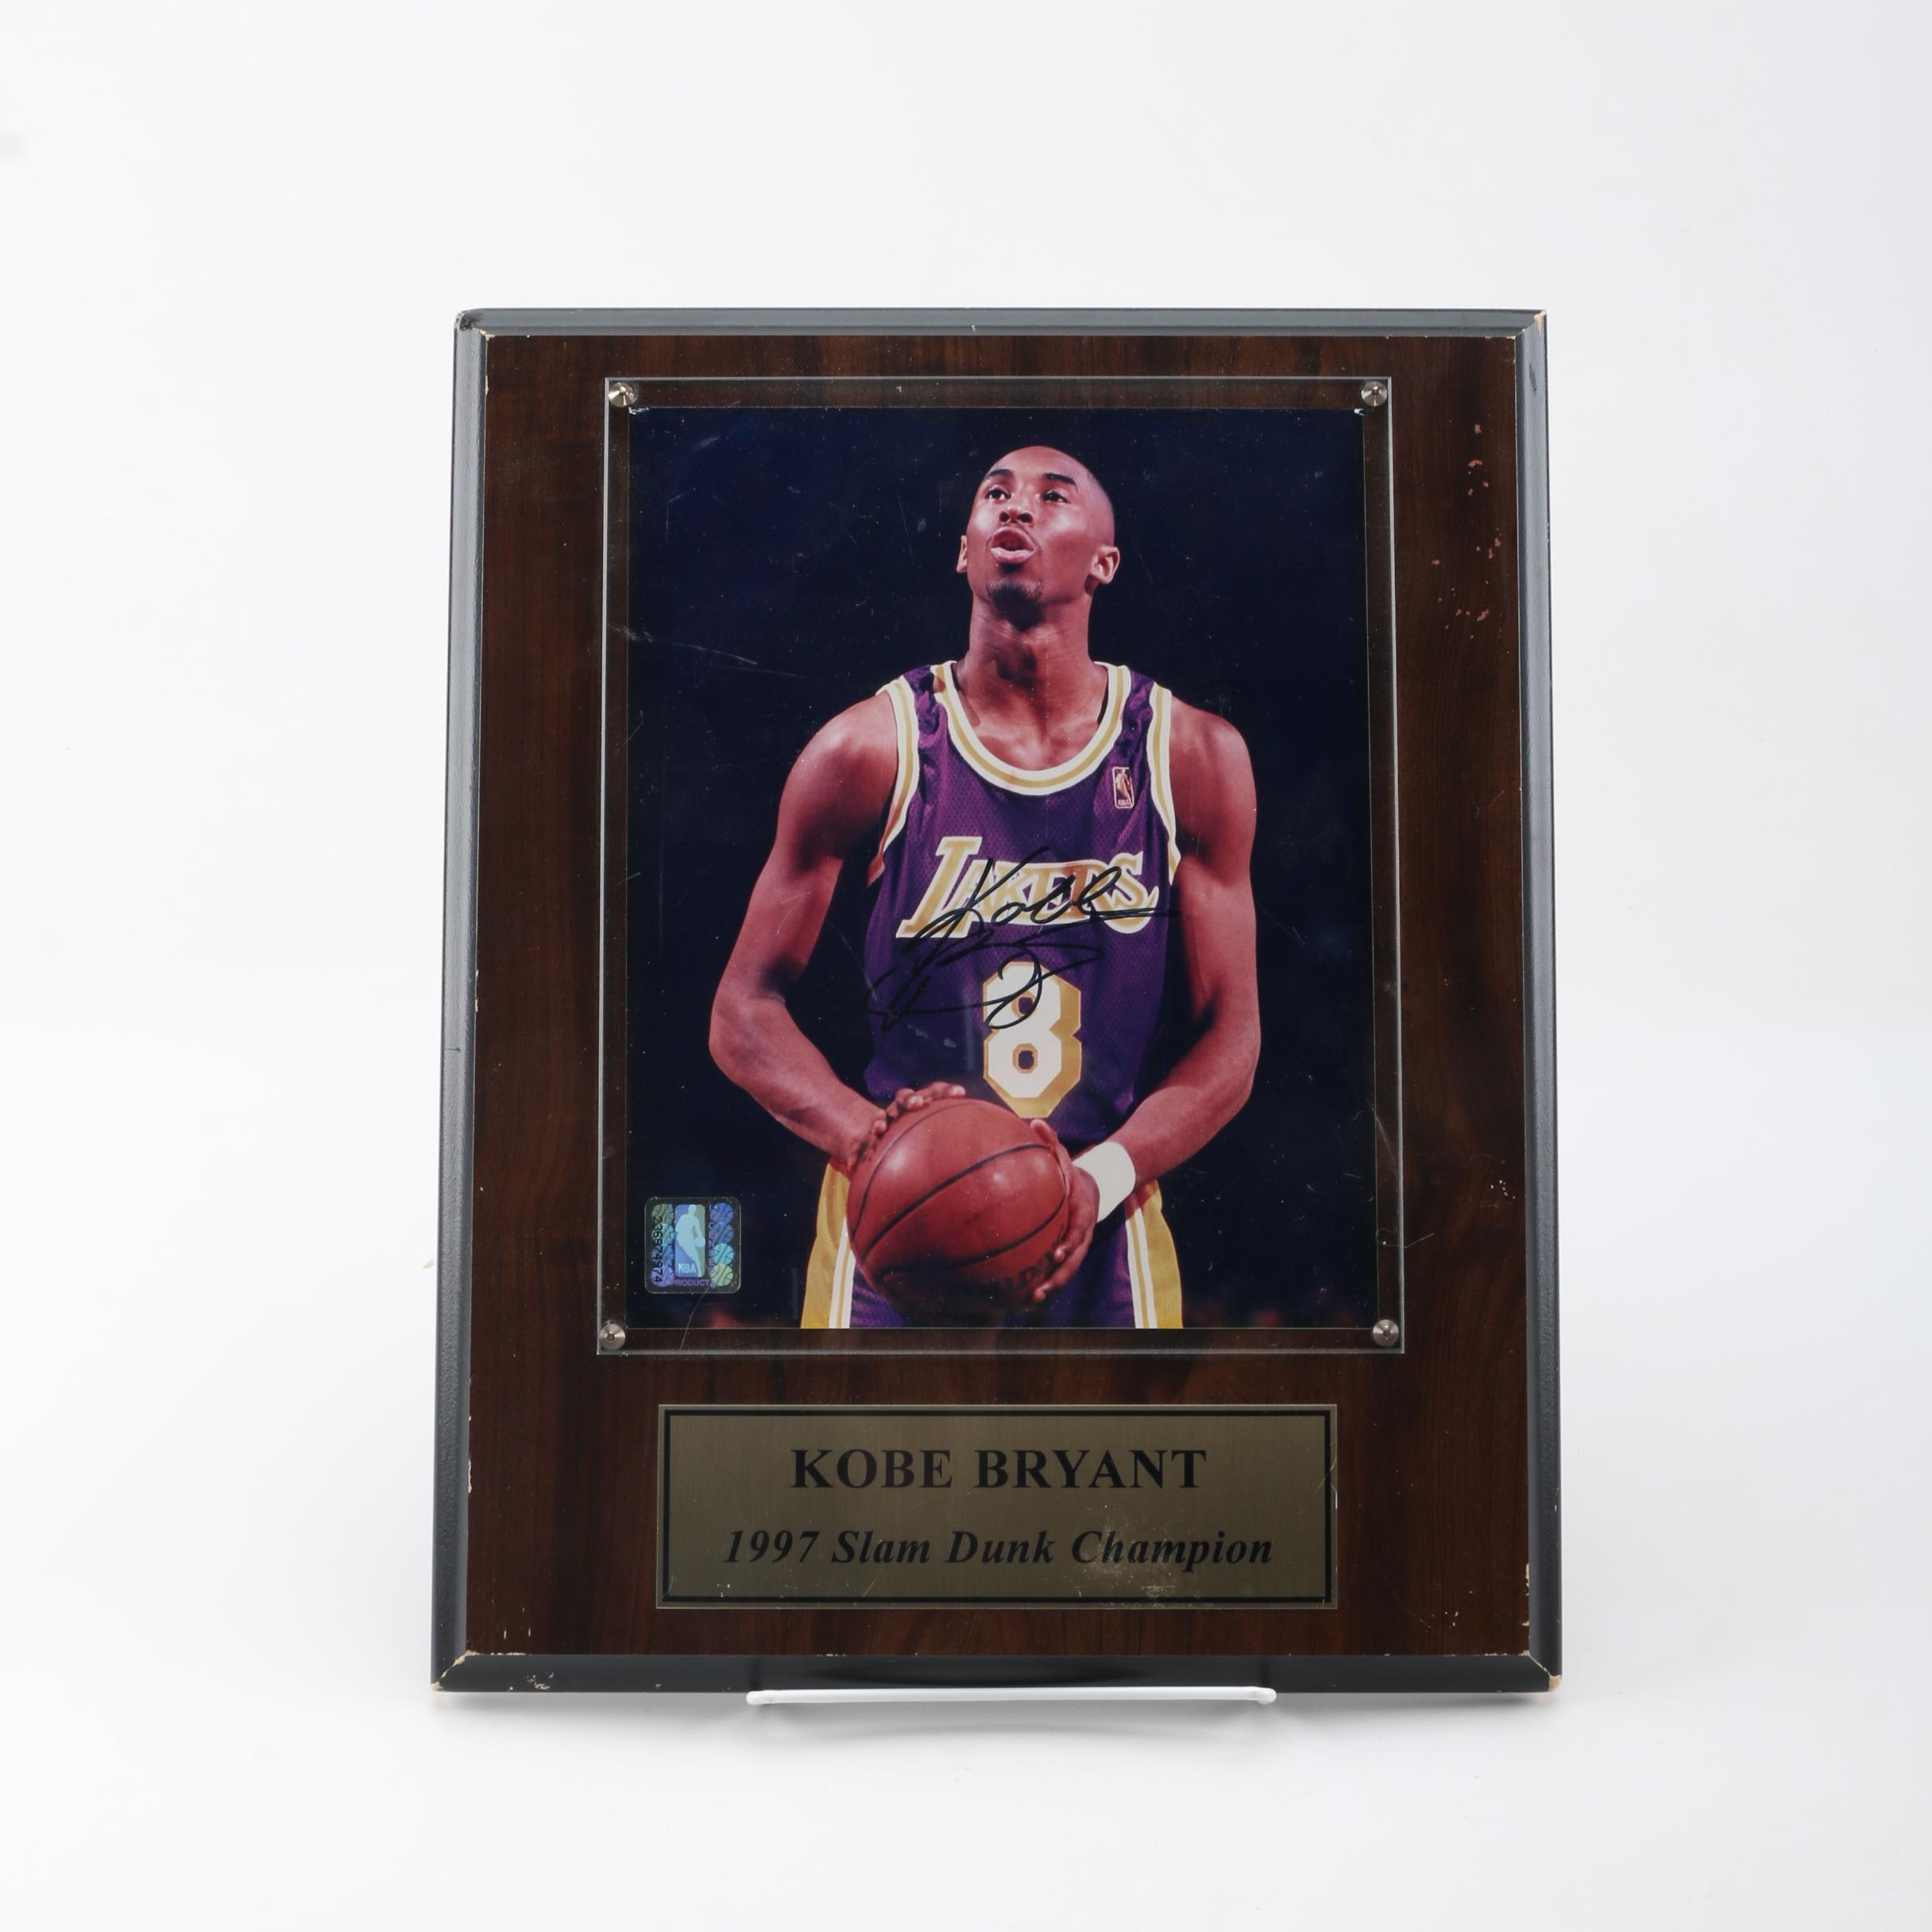 """1997 Slam Dunk Champion"" Autographed Kobe Bryant Photograph"